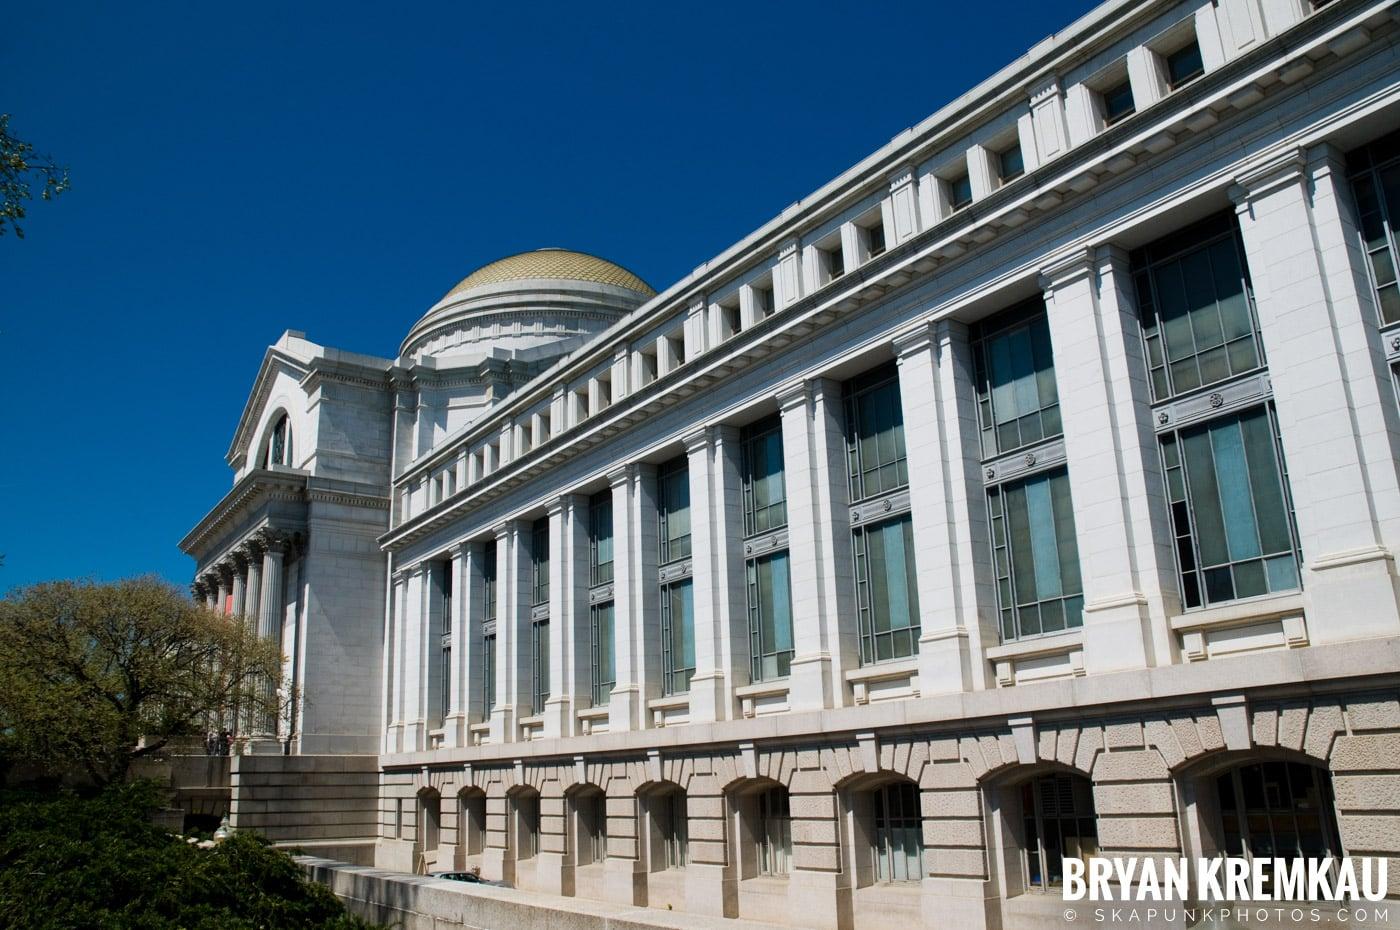 Washington, DC Trip - Day 3 - 4.10.10 (19)